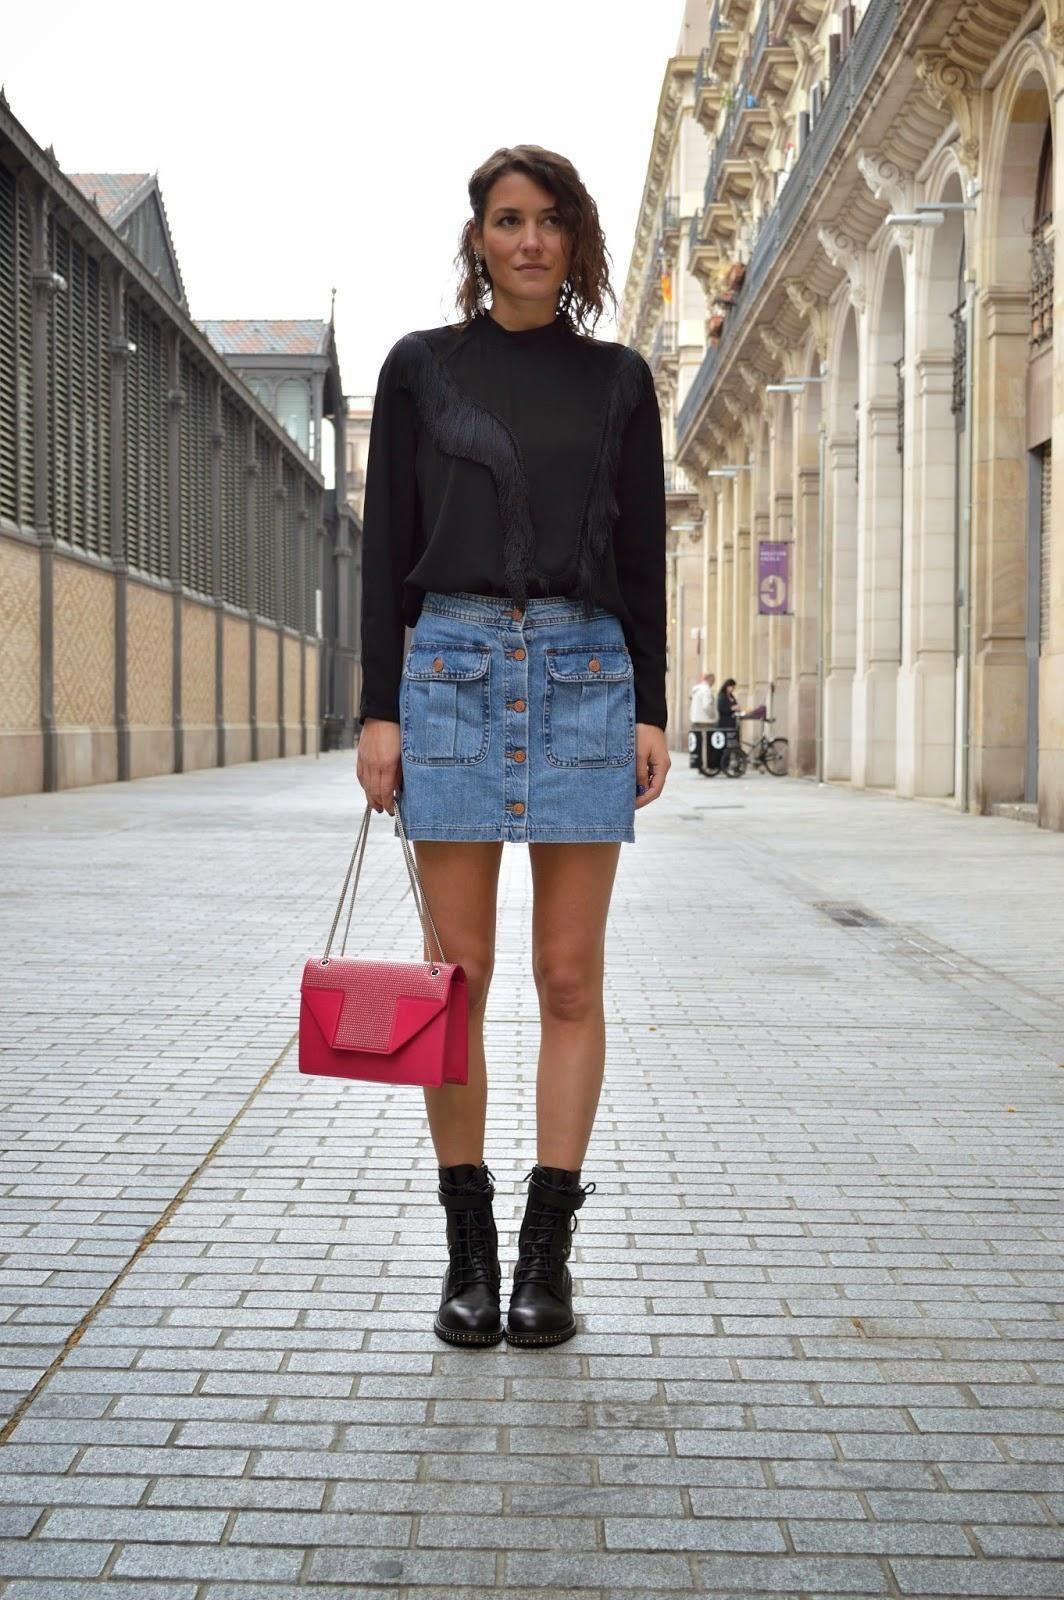 20 modern ways to style a denim skirt for fringe